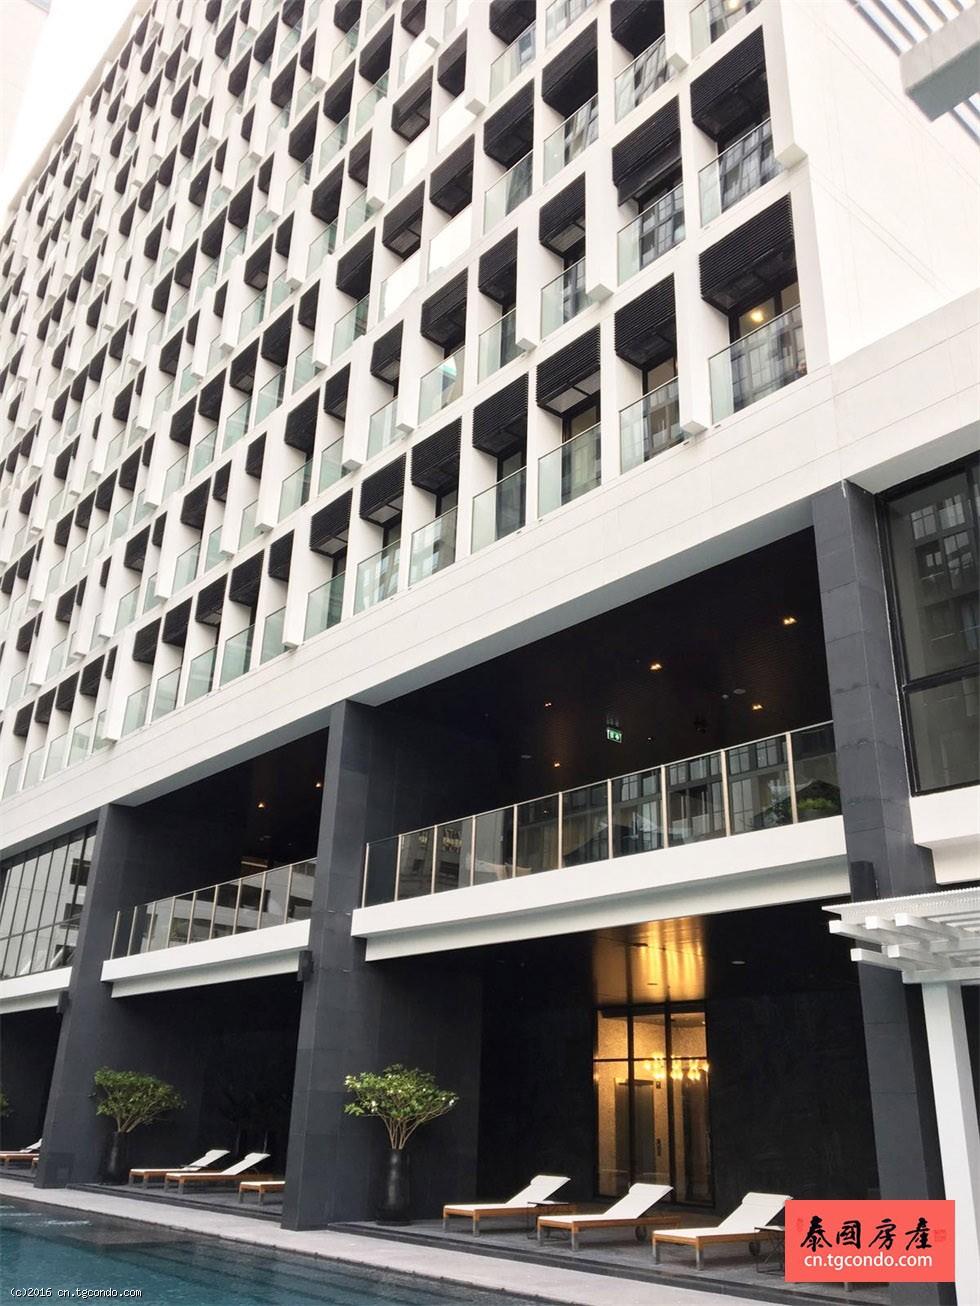 Noble Ploenchit 泰国曼谷精华区奔集顶级地段现房